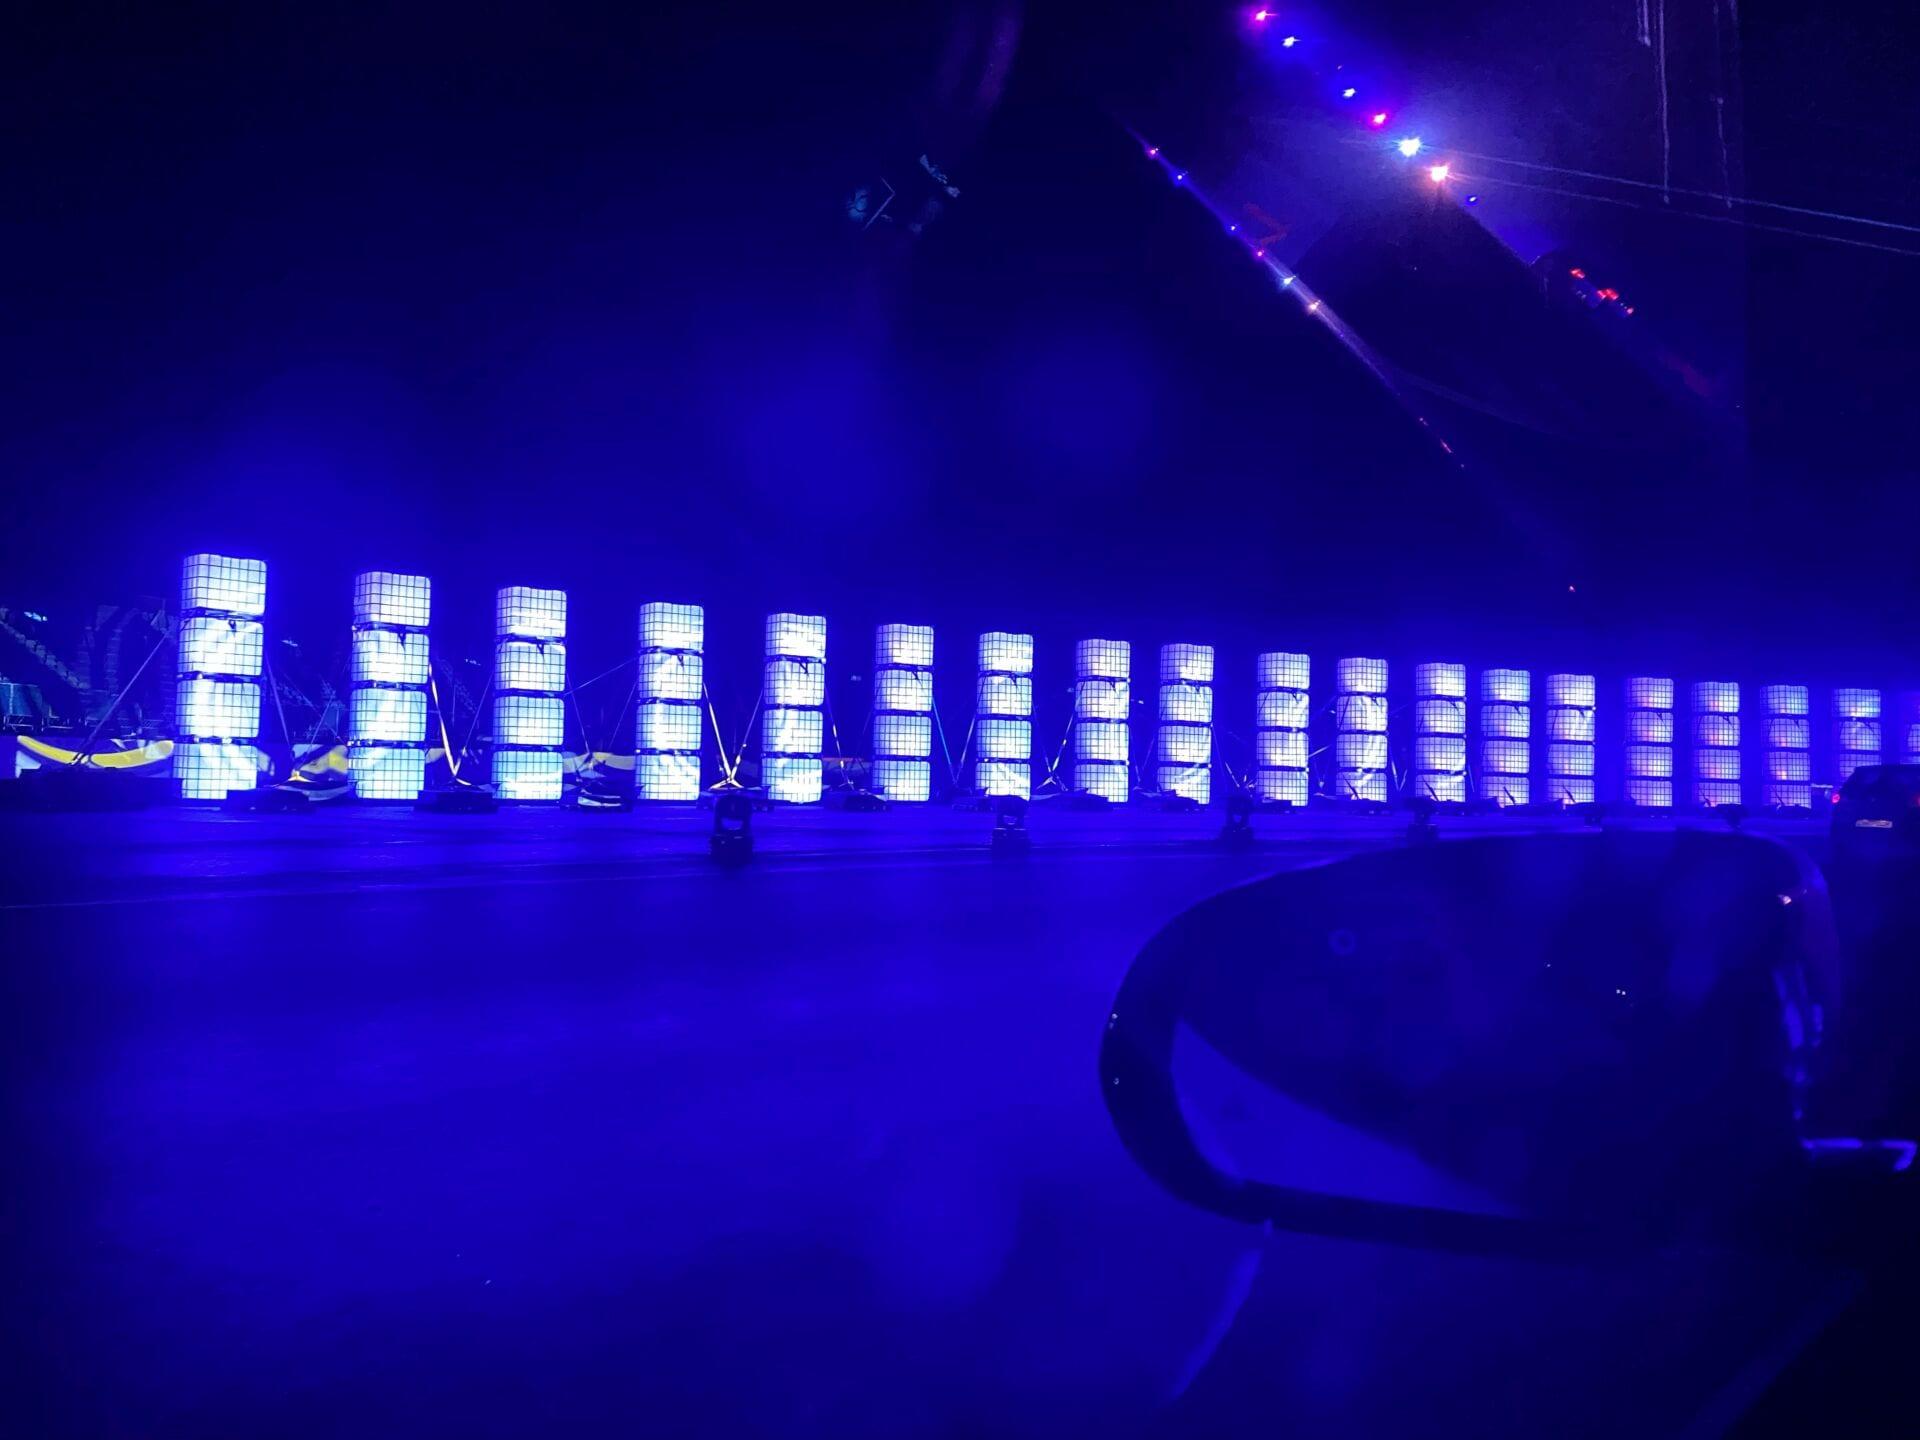 Lights at Stowe Corner Lapland Silverstone